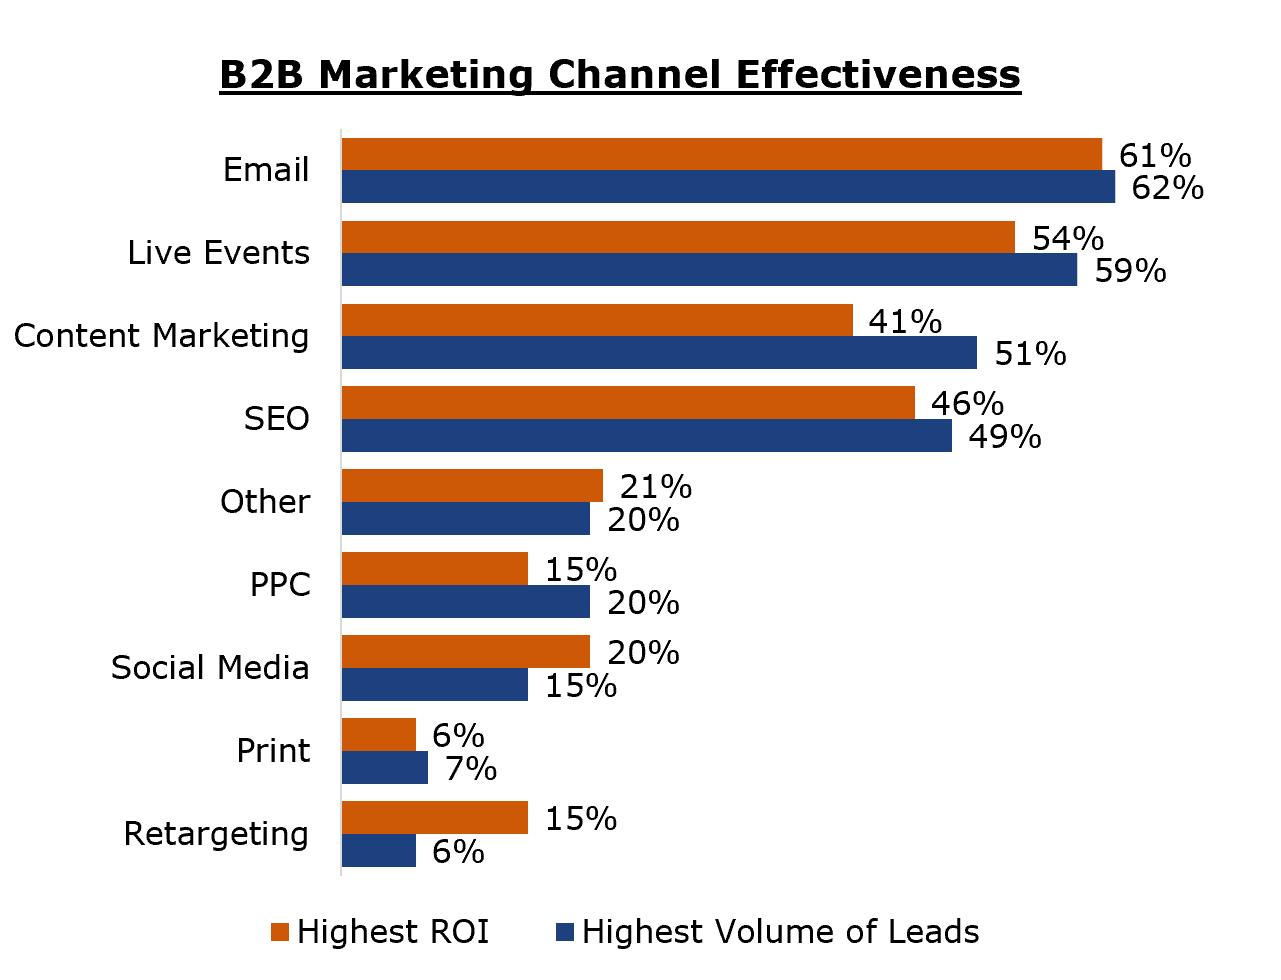 B2B Marketing Effectiveness By Channel